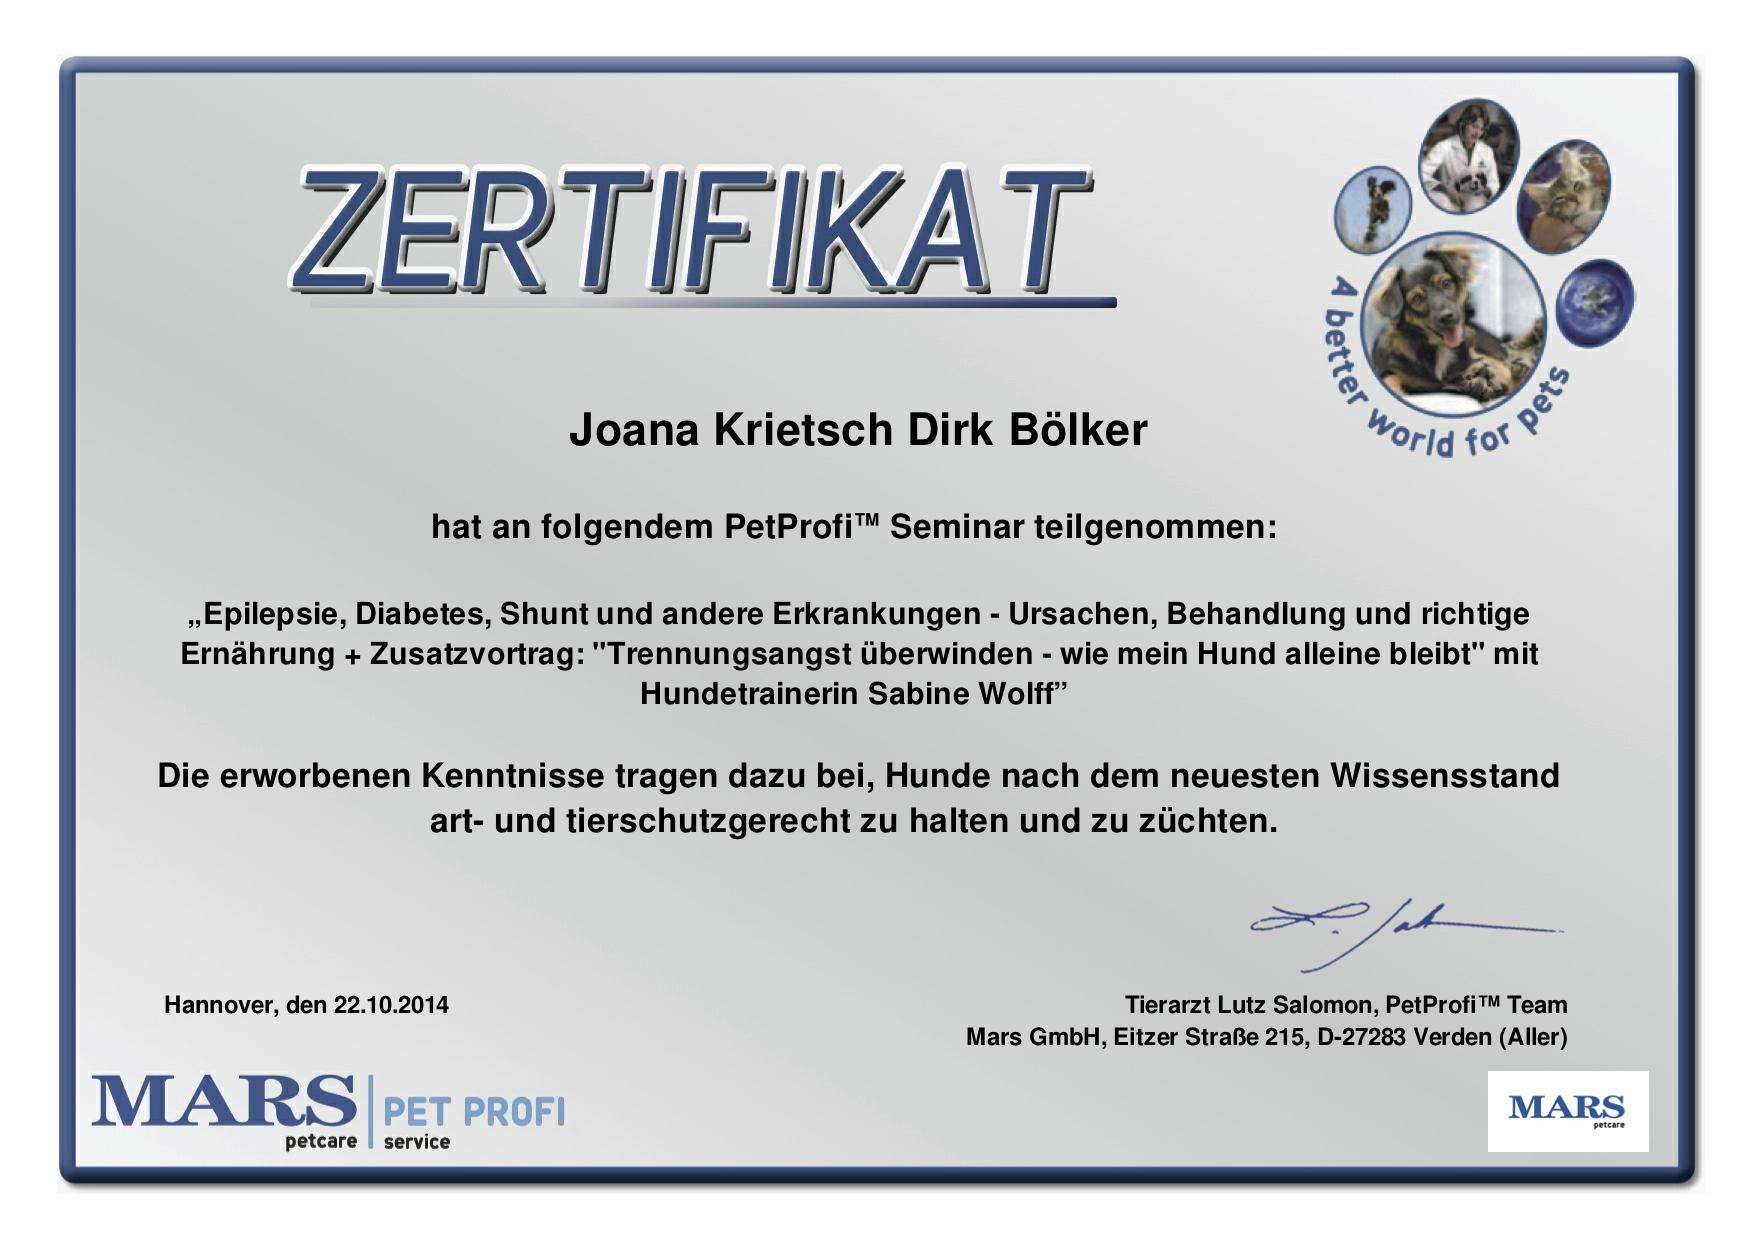 20180605-124903_Zertifikat